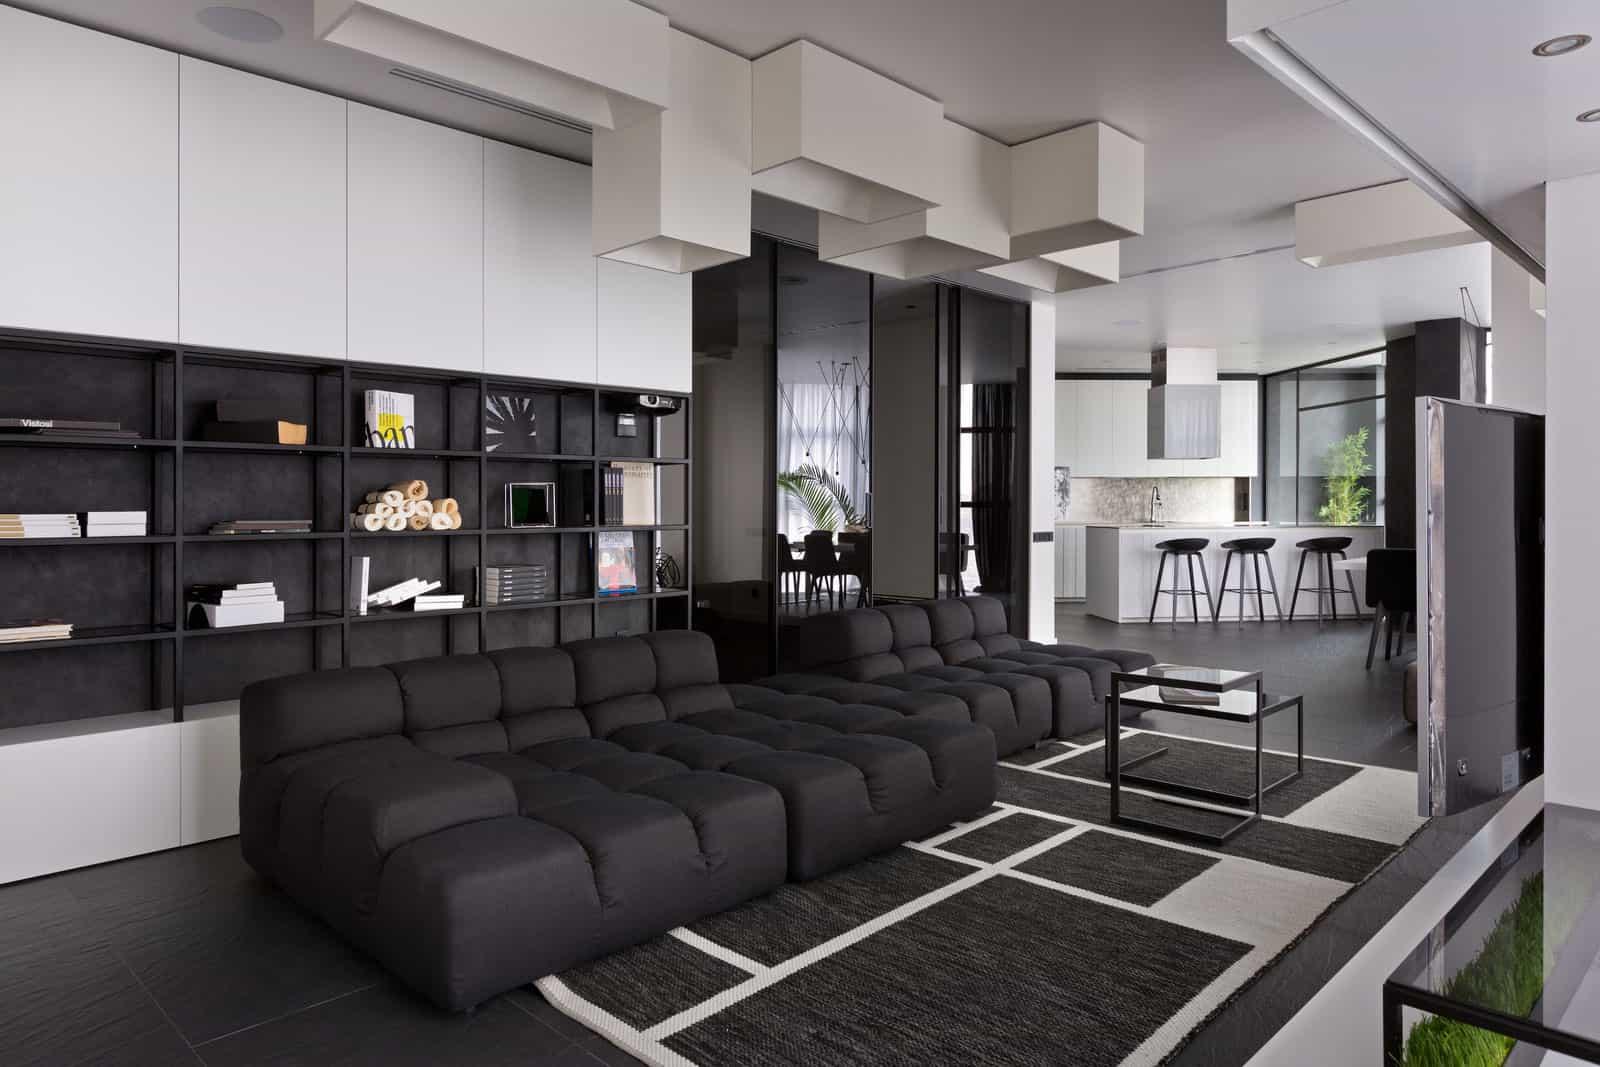 Lera katasonova design creates a black and white apartment for a young couple